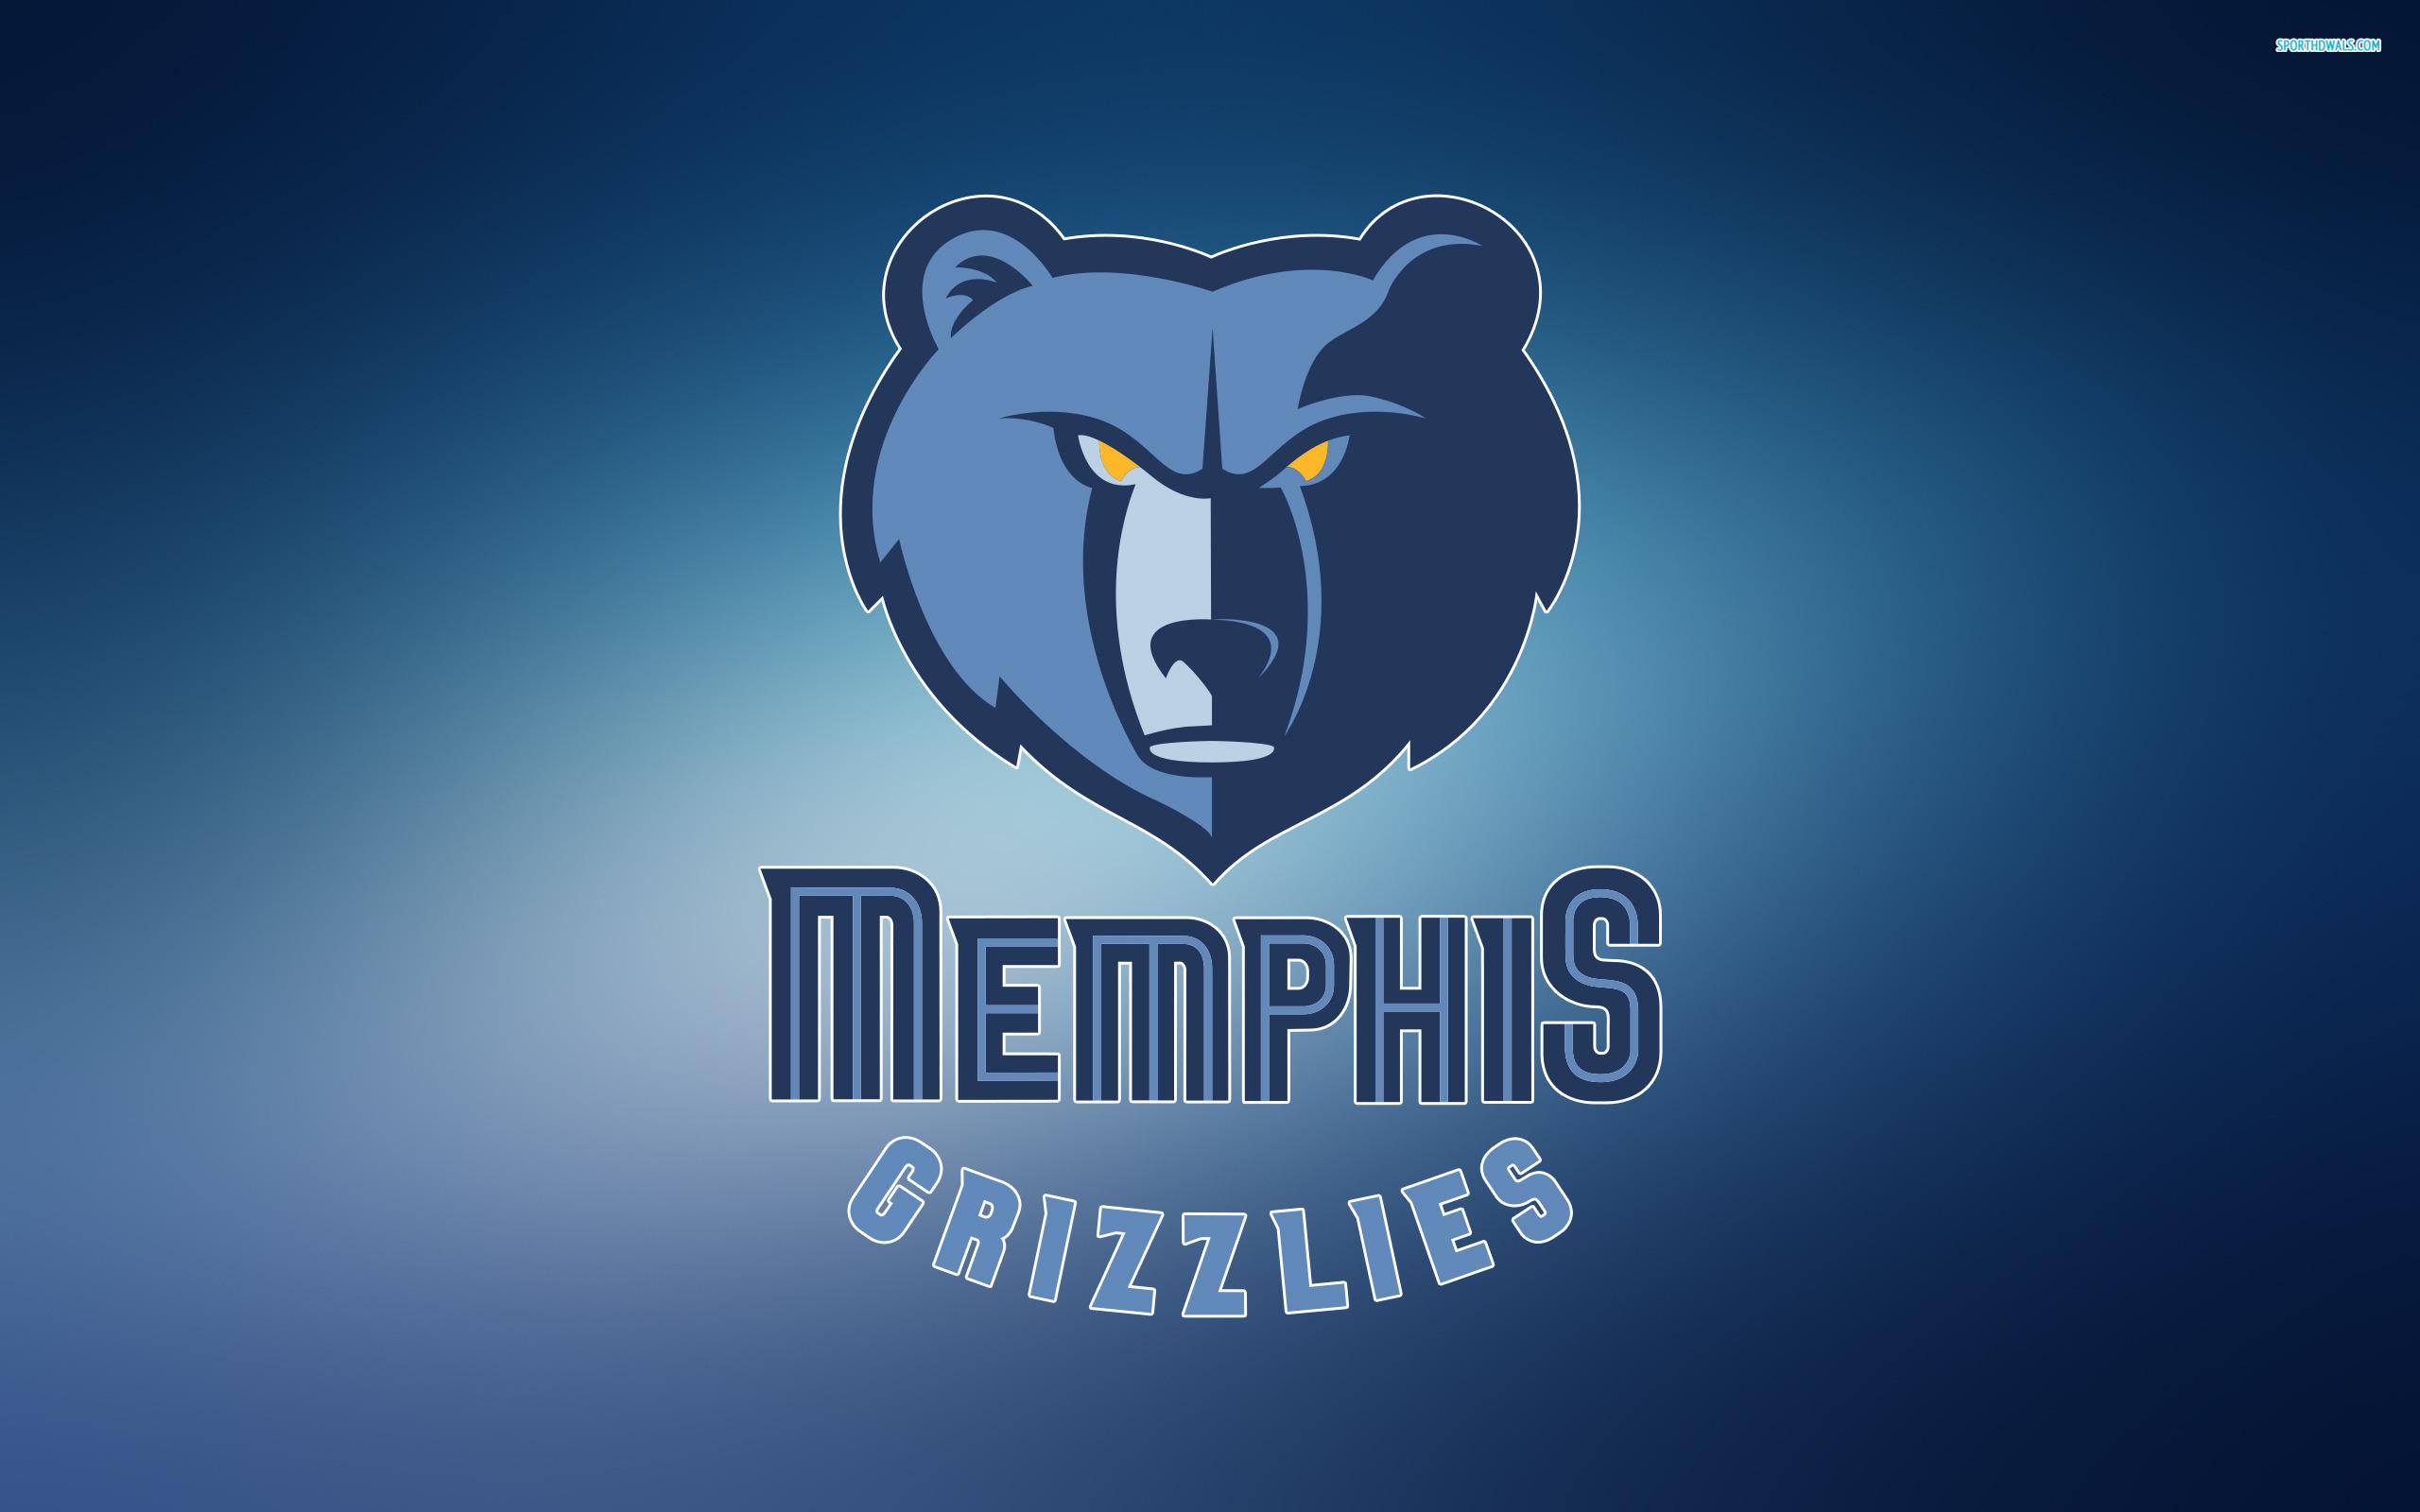 Memphis Grizzlies Wallpaper 18120 2560x1440 px